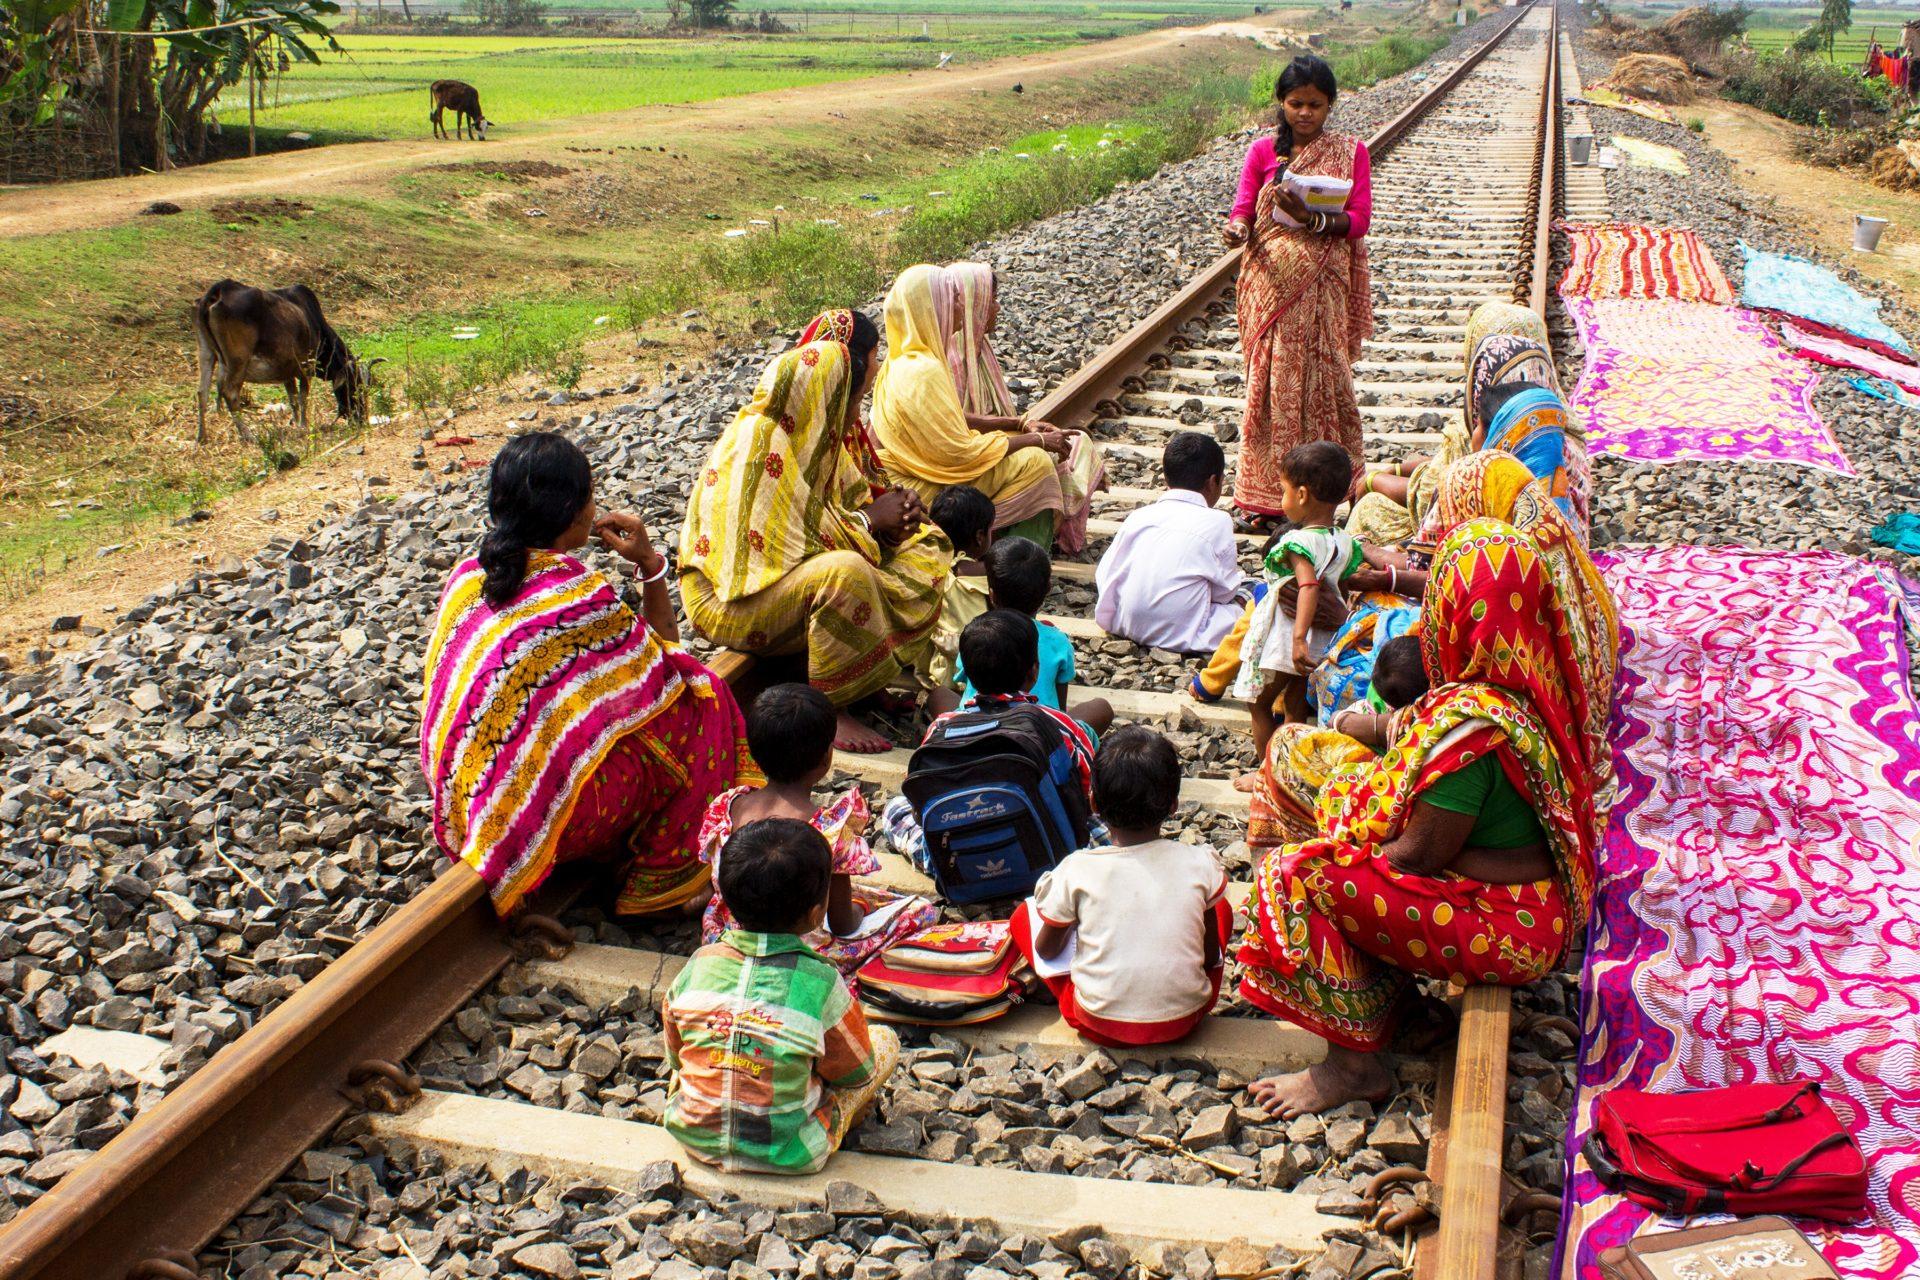 Women teaches women and children on a train track.